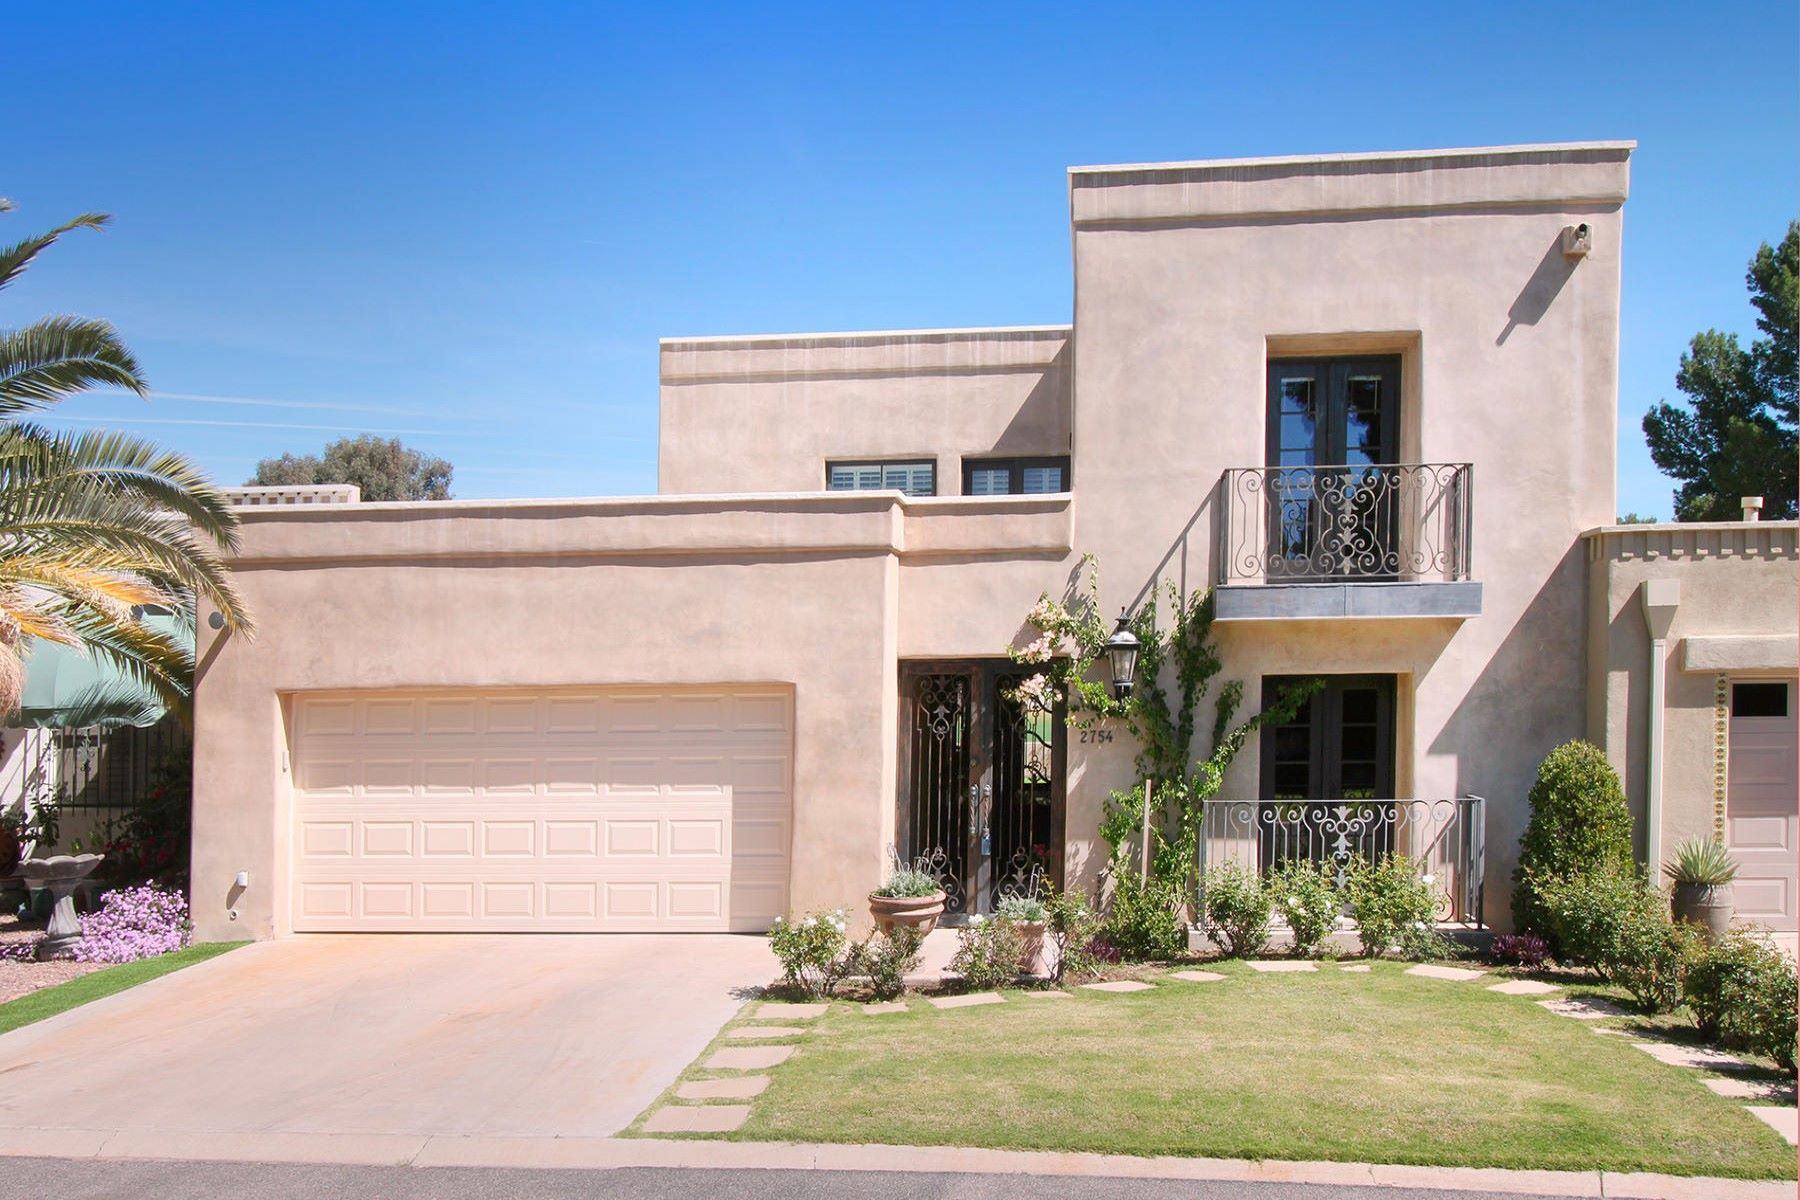 联栋屋 为 销售 在 Luxurious Villa in Tucson National 2754 W Magee Road 图森, 亚利桑那州, 85742 美国